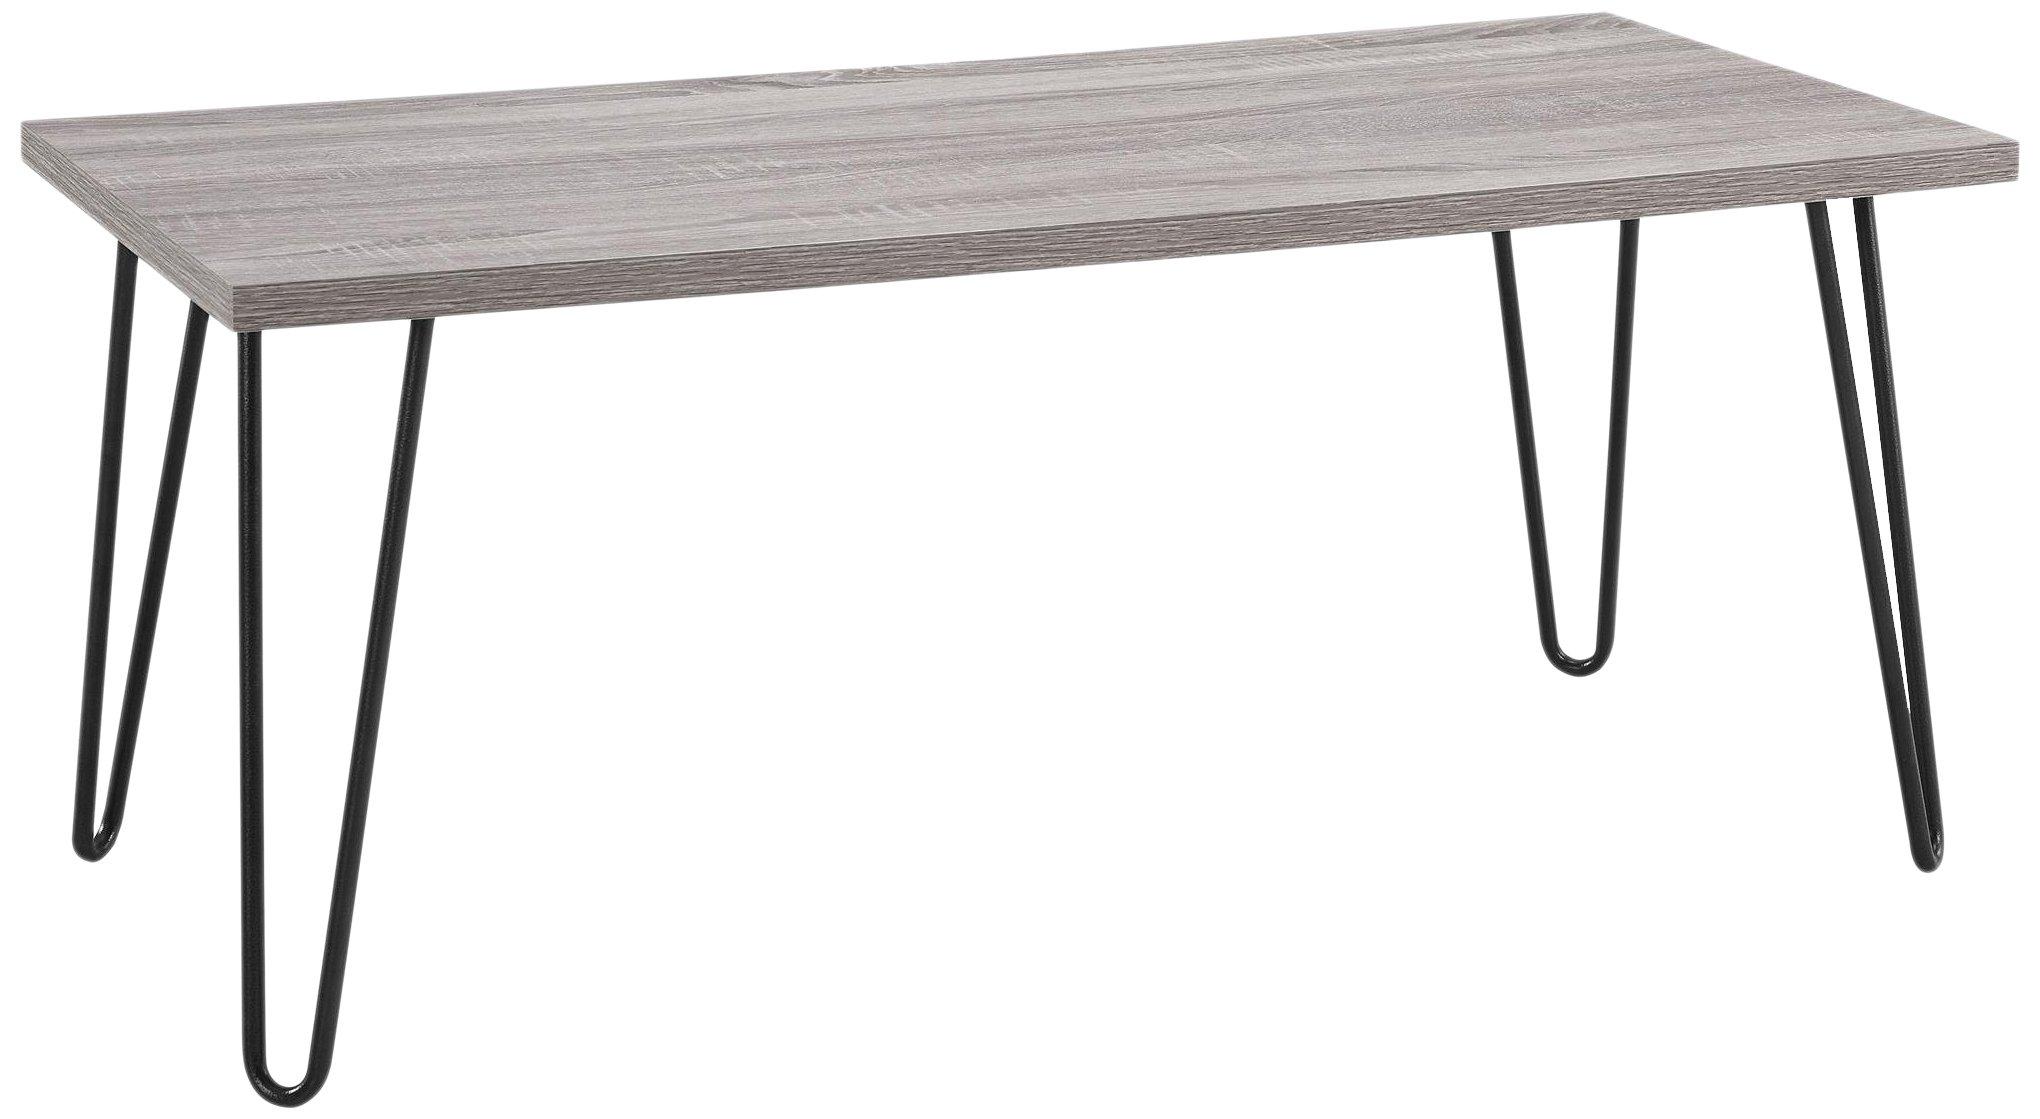 Ameriwood Home  Owen Retro Coffee Table with Metal Legs, Sonoma Oak Gunmetal Gray by Ameriwood Home